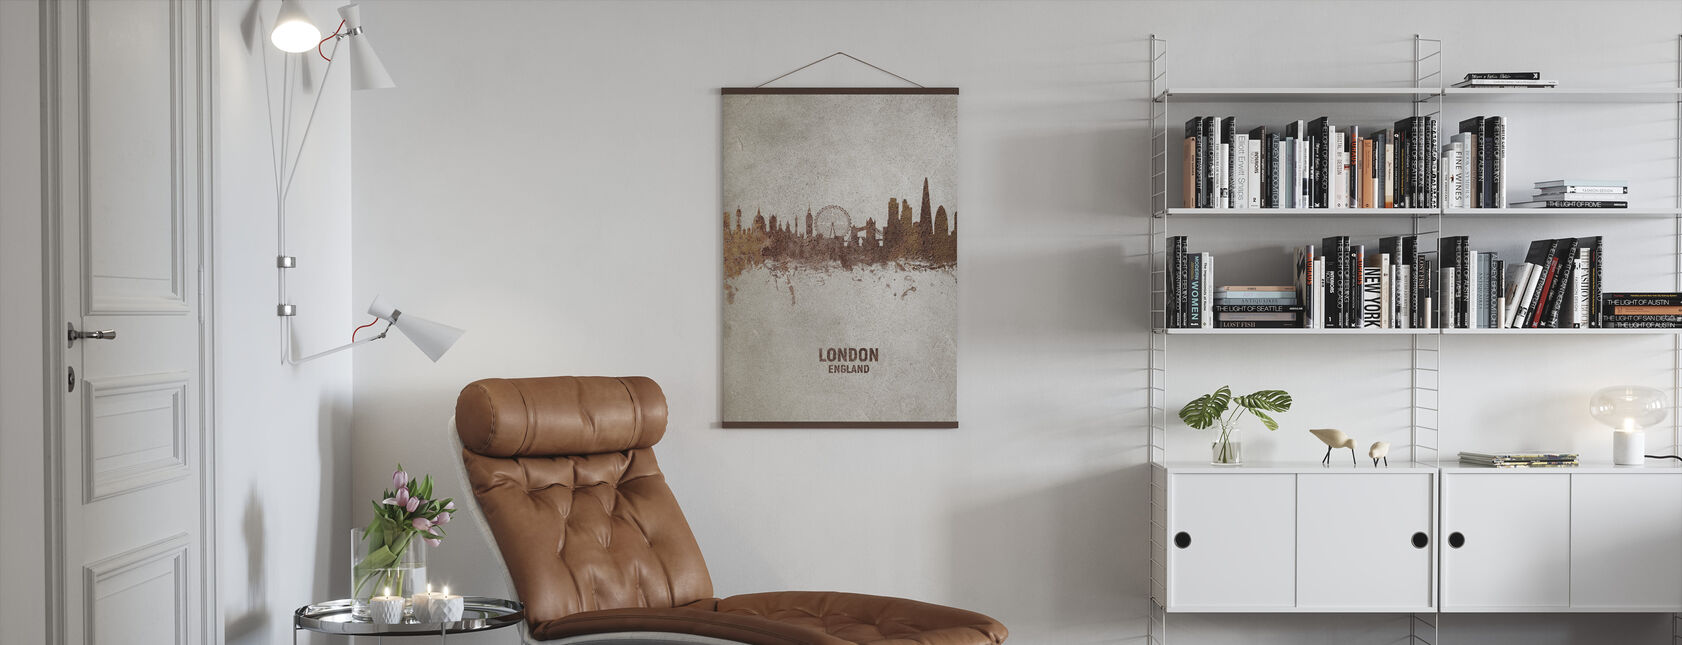 London England Rust Skyline - Poster - Living Room